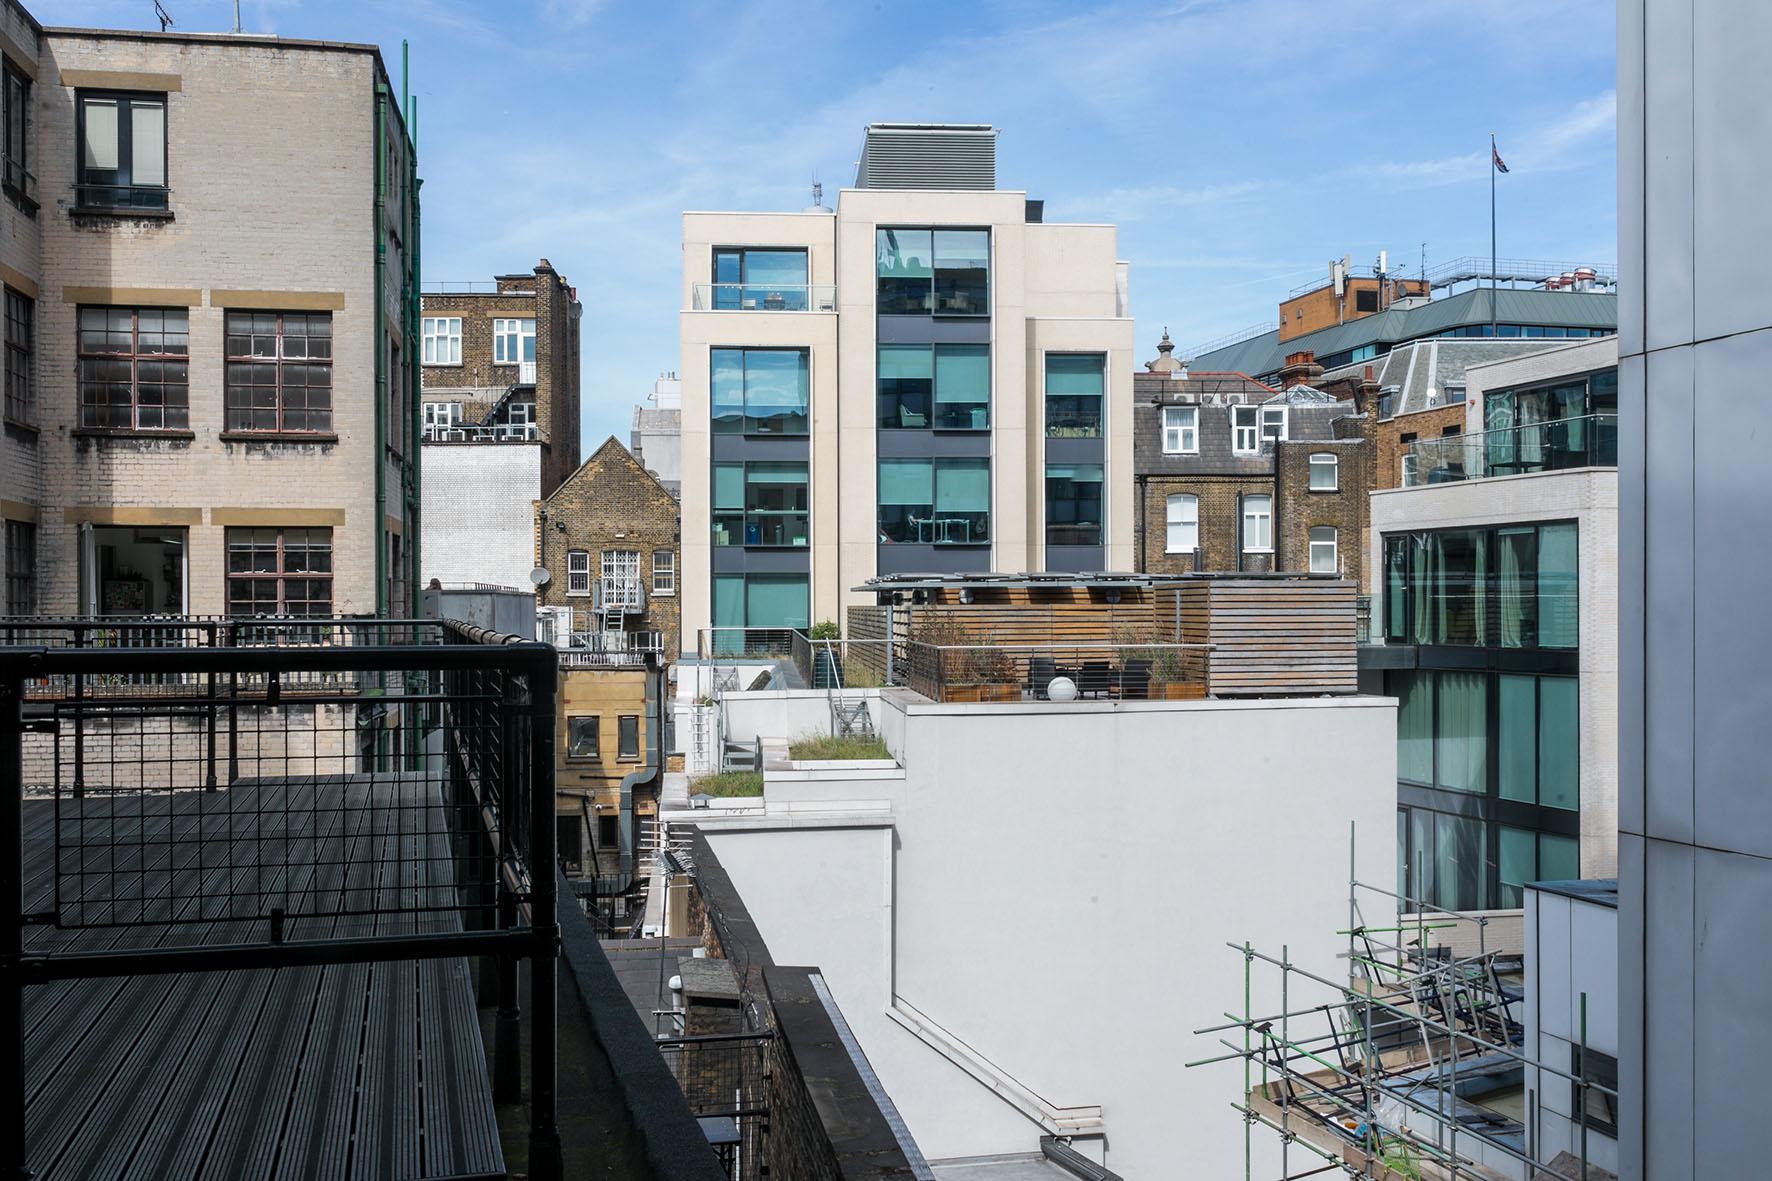 Lovelydays luxury service apartment rental - London - Soho - Oxford Street V - Lovelysuite - 1 bedrooms - 1 bathrooms - Exterior - be00e6a00c10 - Lovelydays